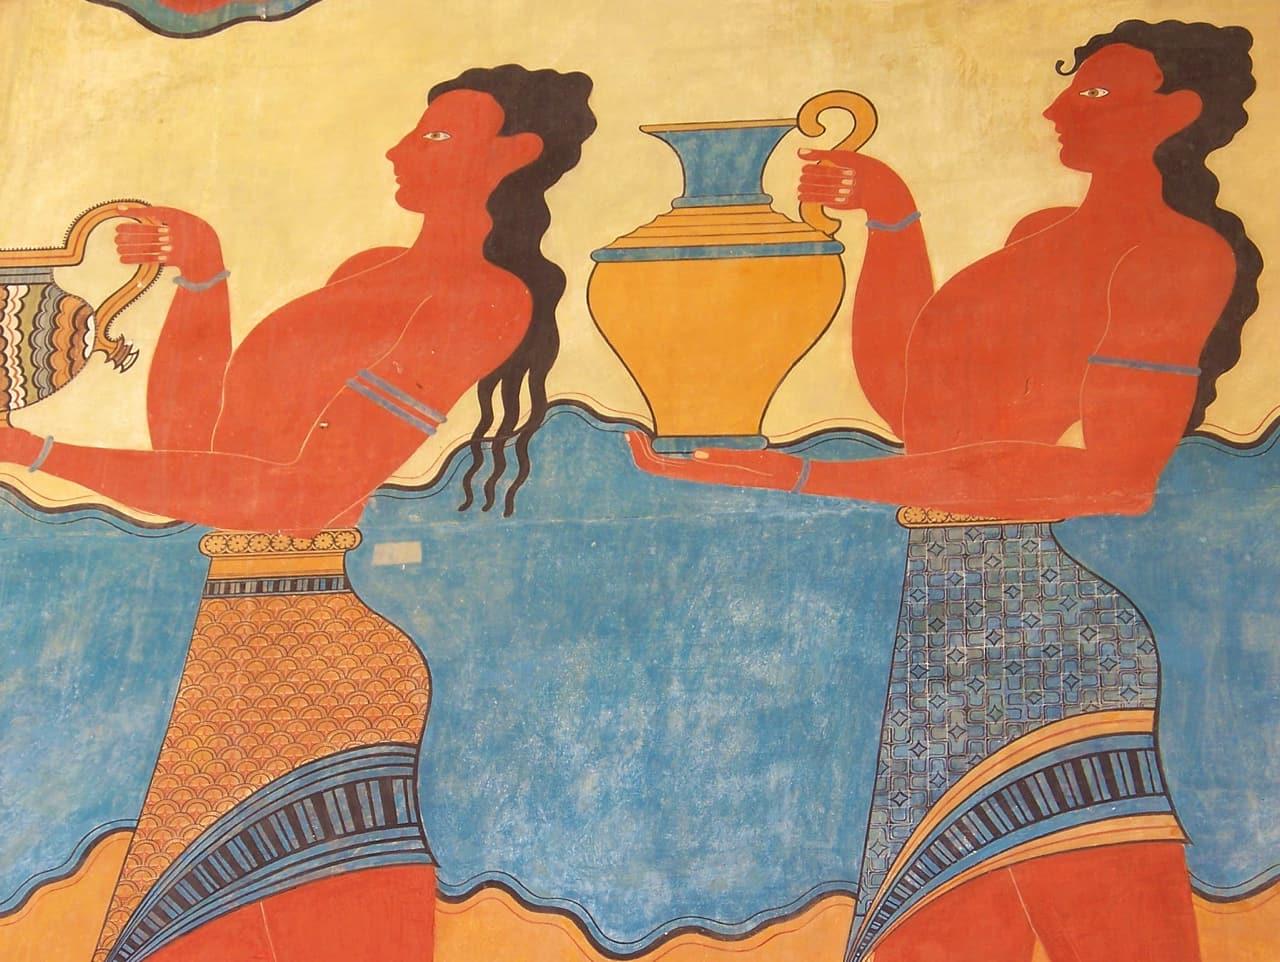 Minos - The Nine Years King Outside Of Knossos Minoan Palace, Minos - The Nine Years King Outside Of Knossos Minoan Palace tour, activities arhanes village, activities knosos minoan palace, activities heraklion crete, things to do iraklion crete